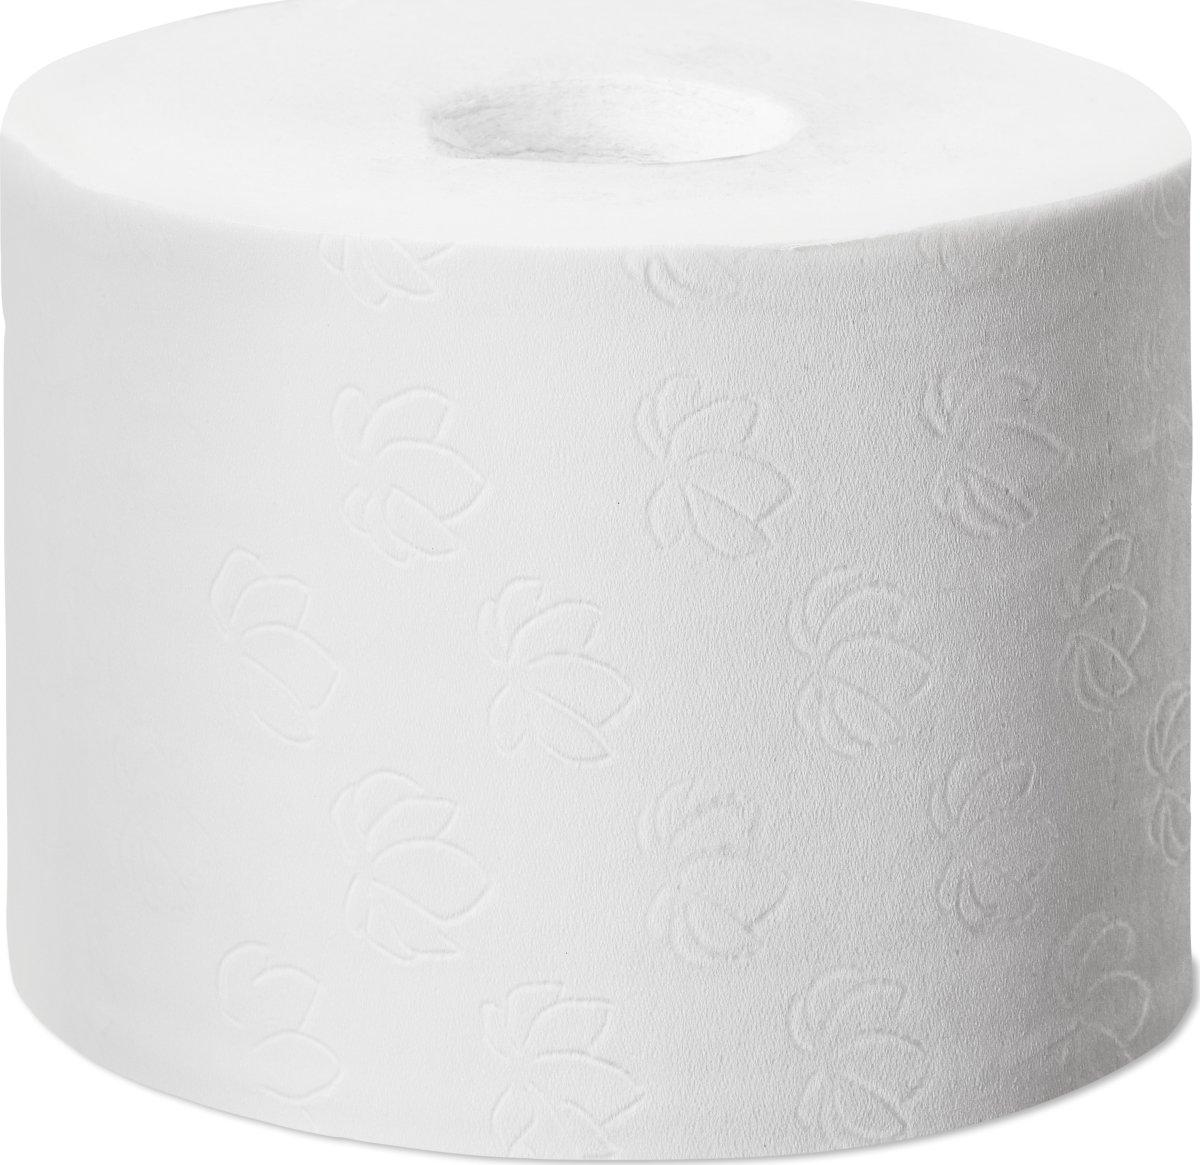 Tork T7 Advanced toiletpapir u. hylse, 2-lags